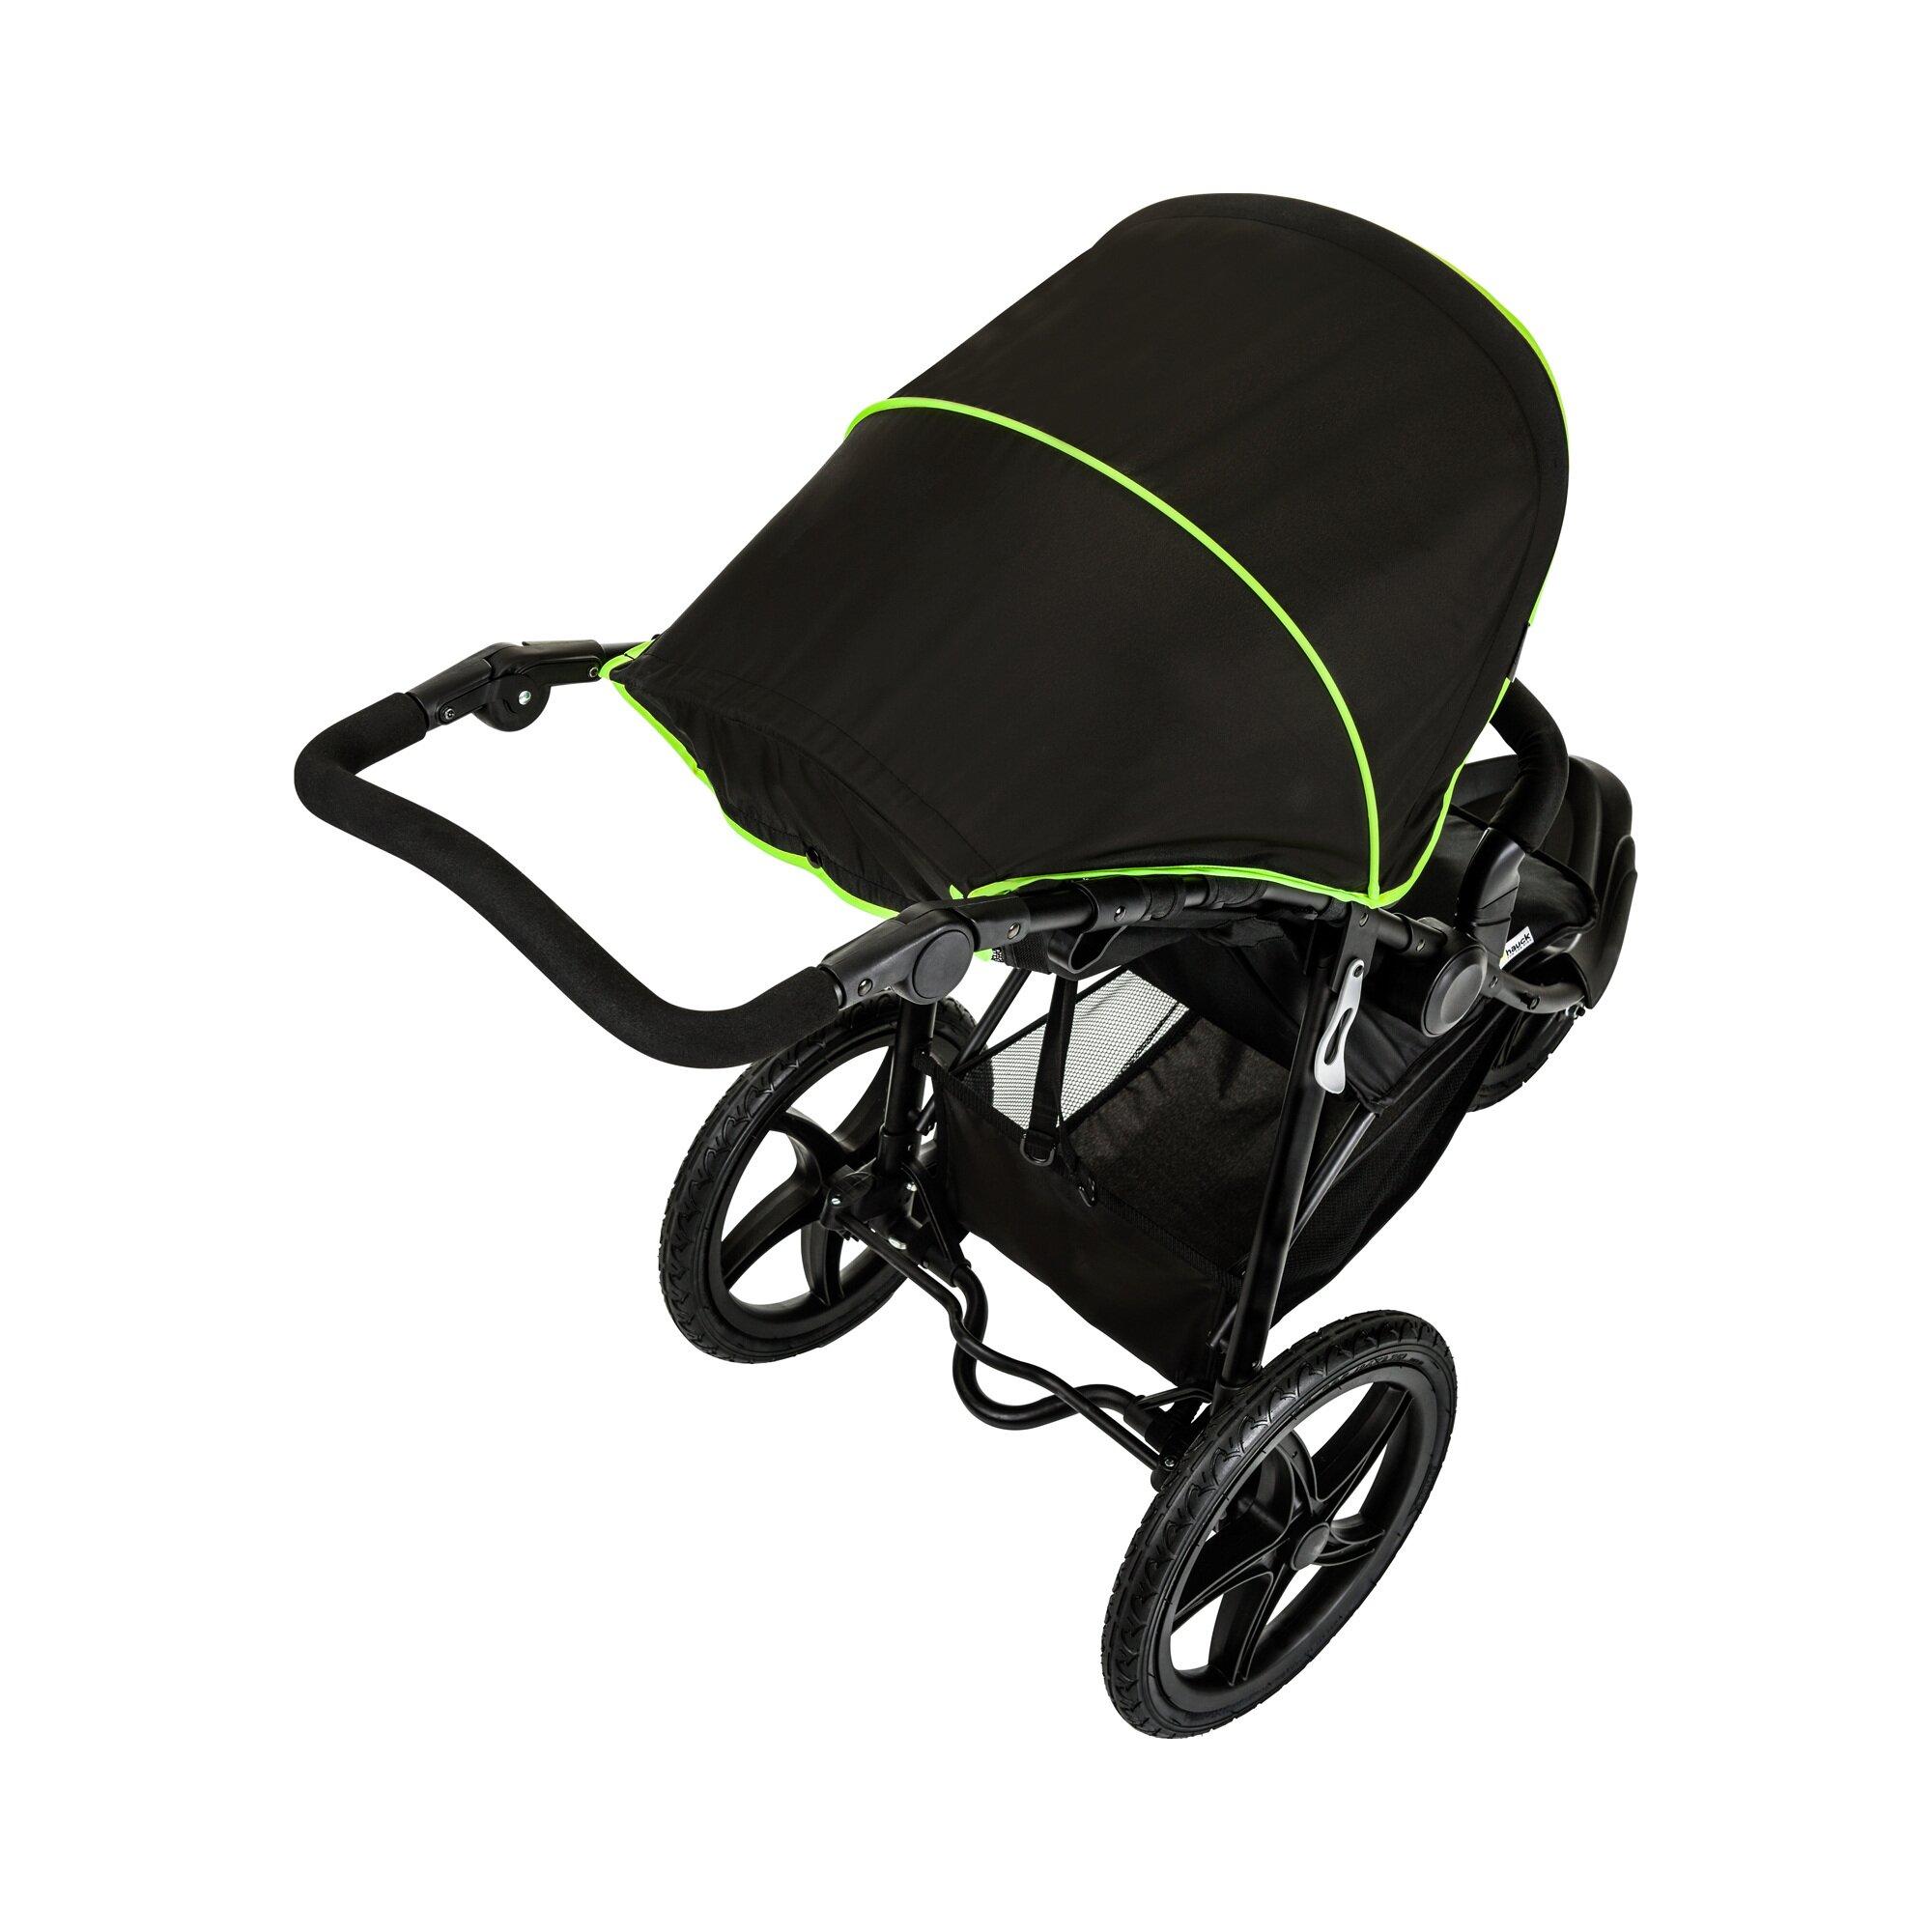 hauck-runner-kinderwagen-sportwagen-design-2018-schwarz